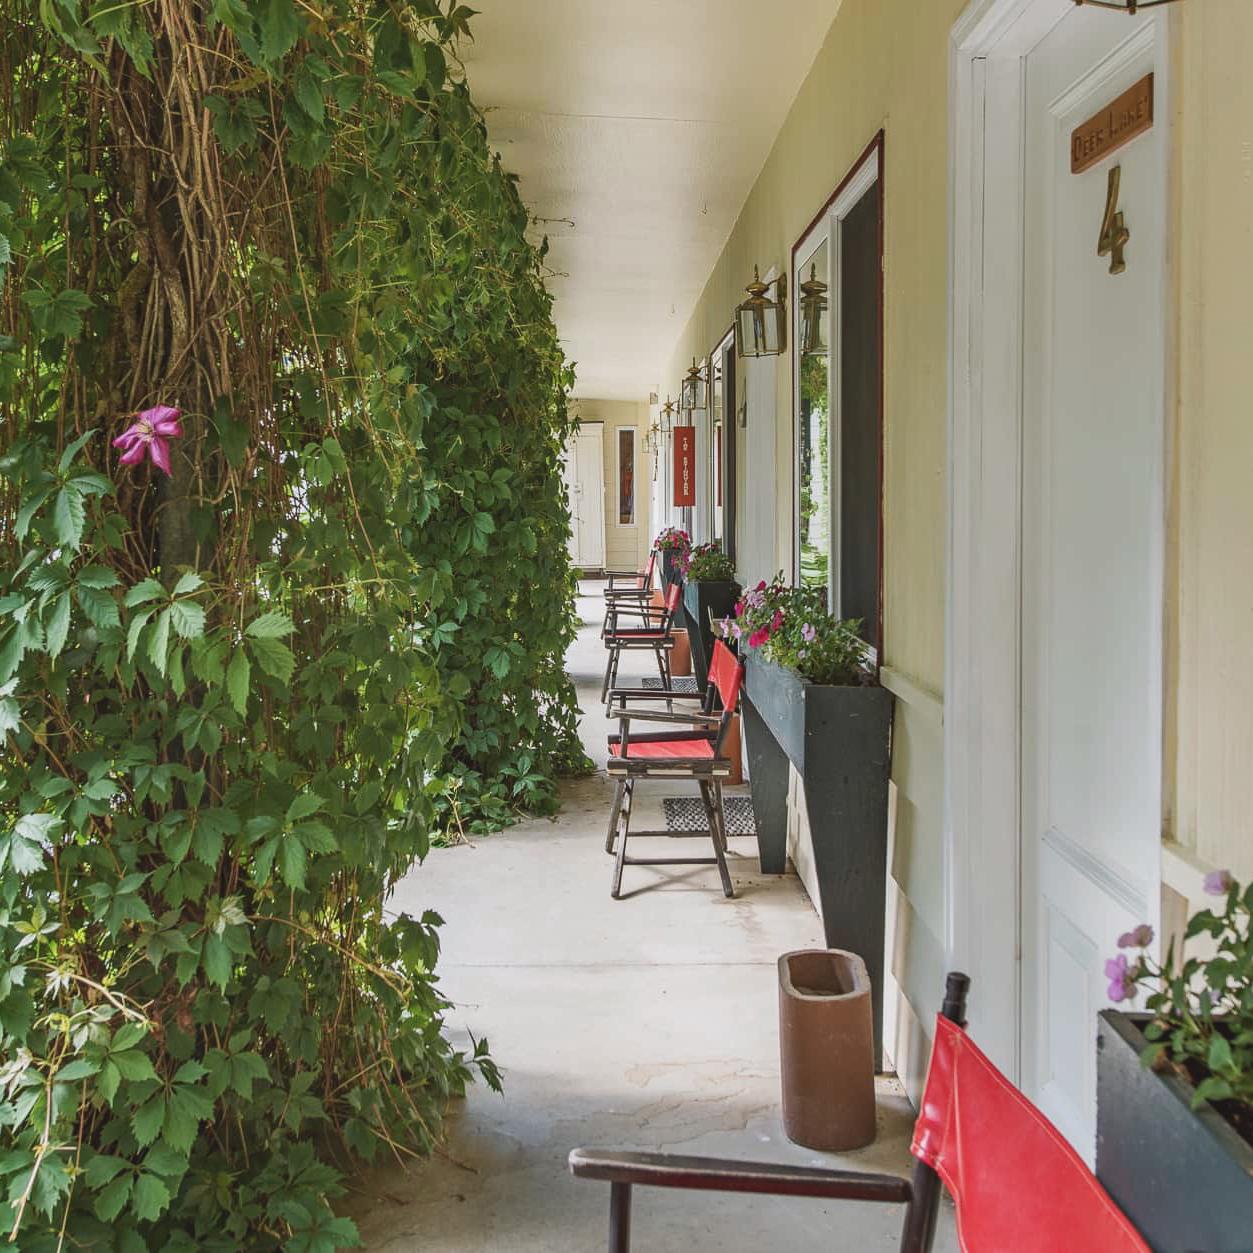 Emerald Valley Inn - Emerald Valley Inn Porch